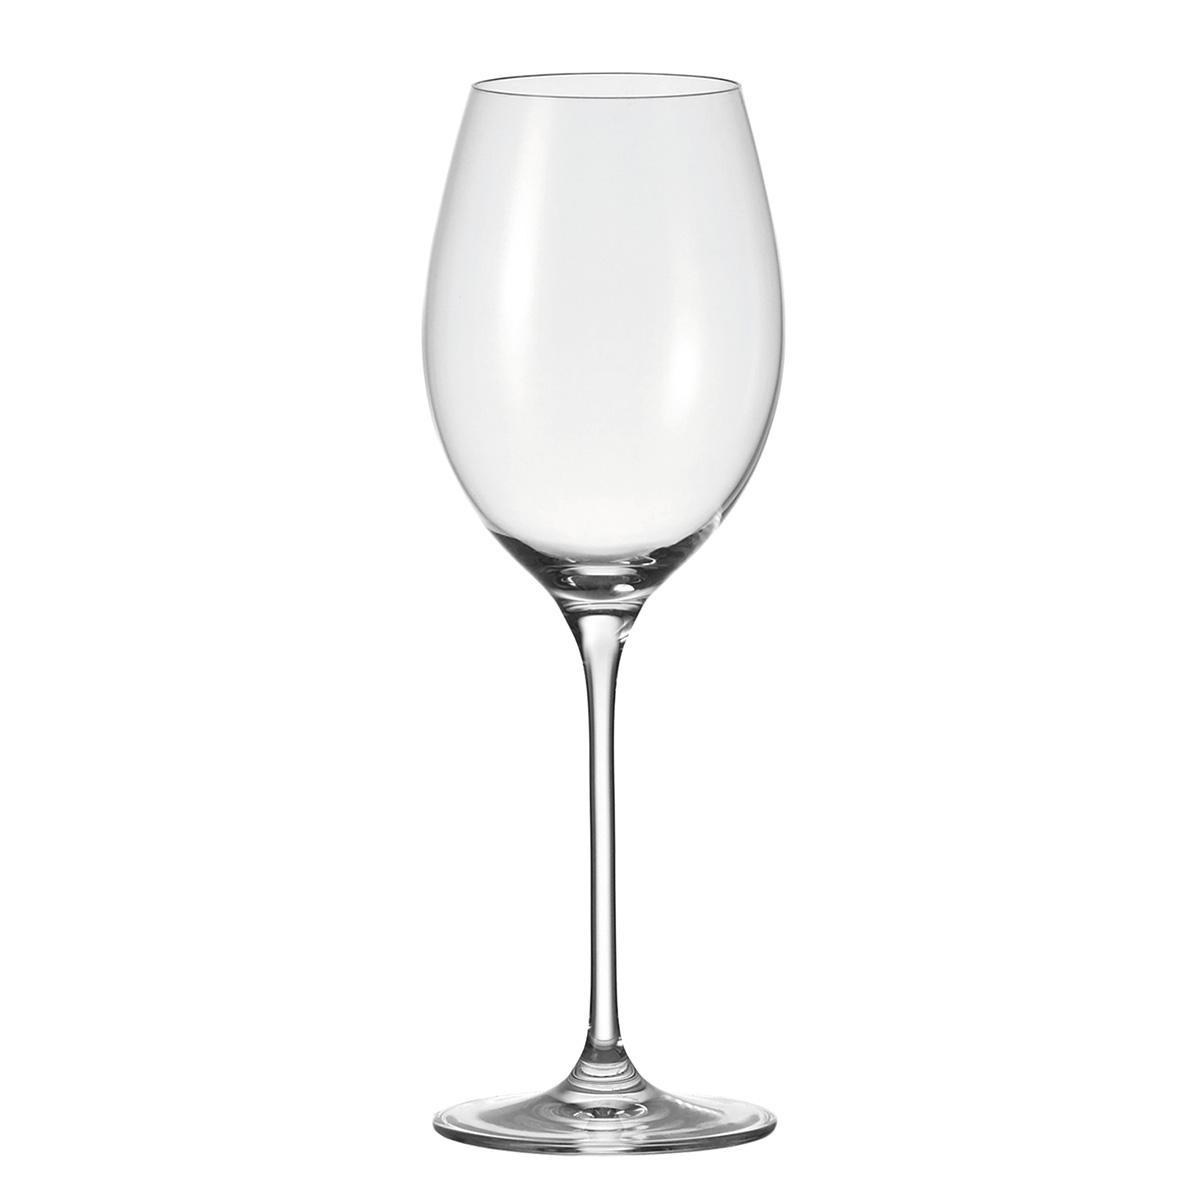 čaša za crveno vino Cheers 61633